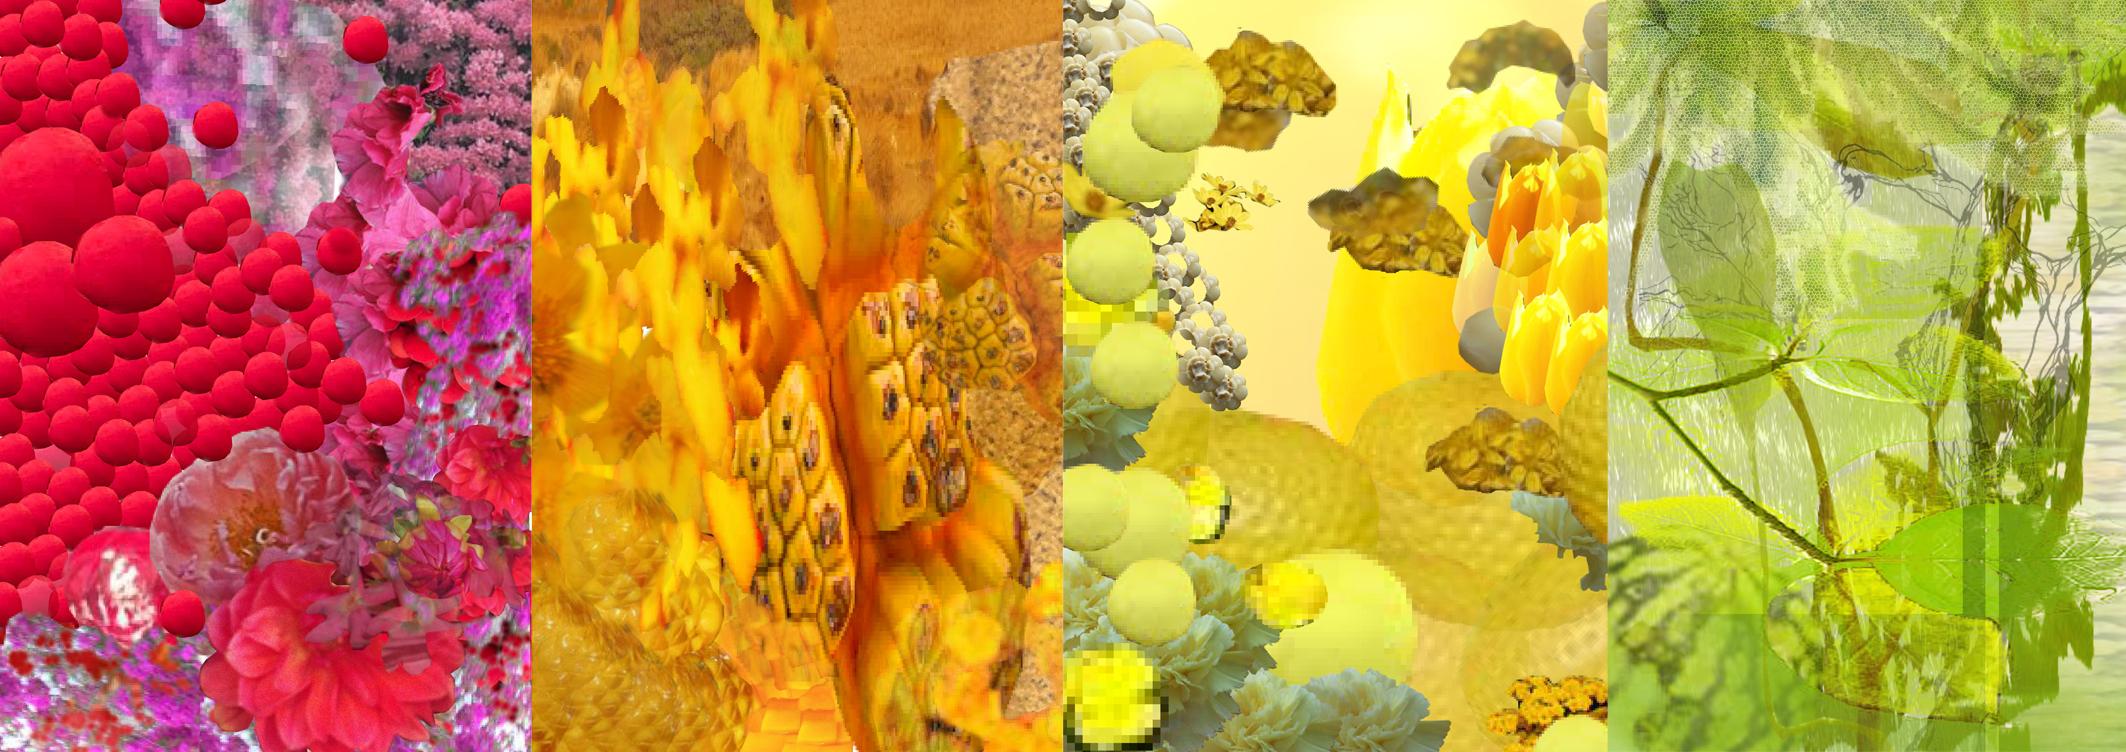 Archive colour system designblog blue purple purple red orange yellow yellow yellow green mightylinksfo